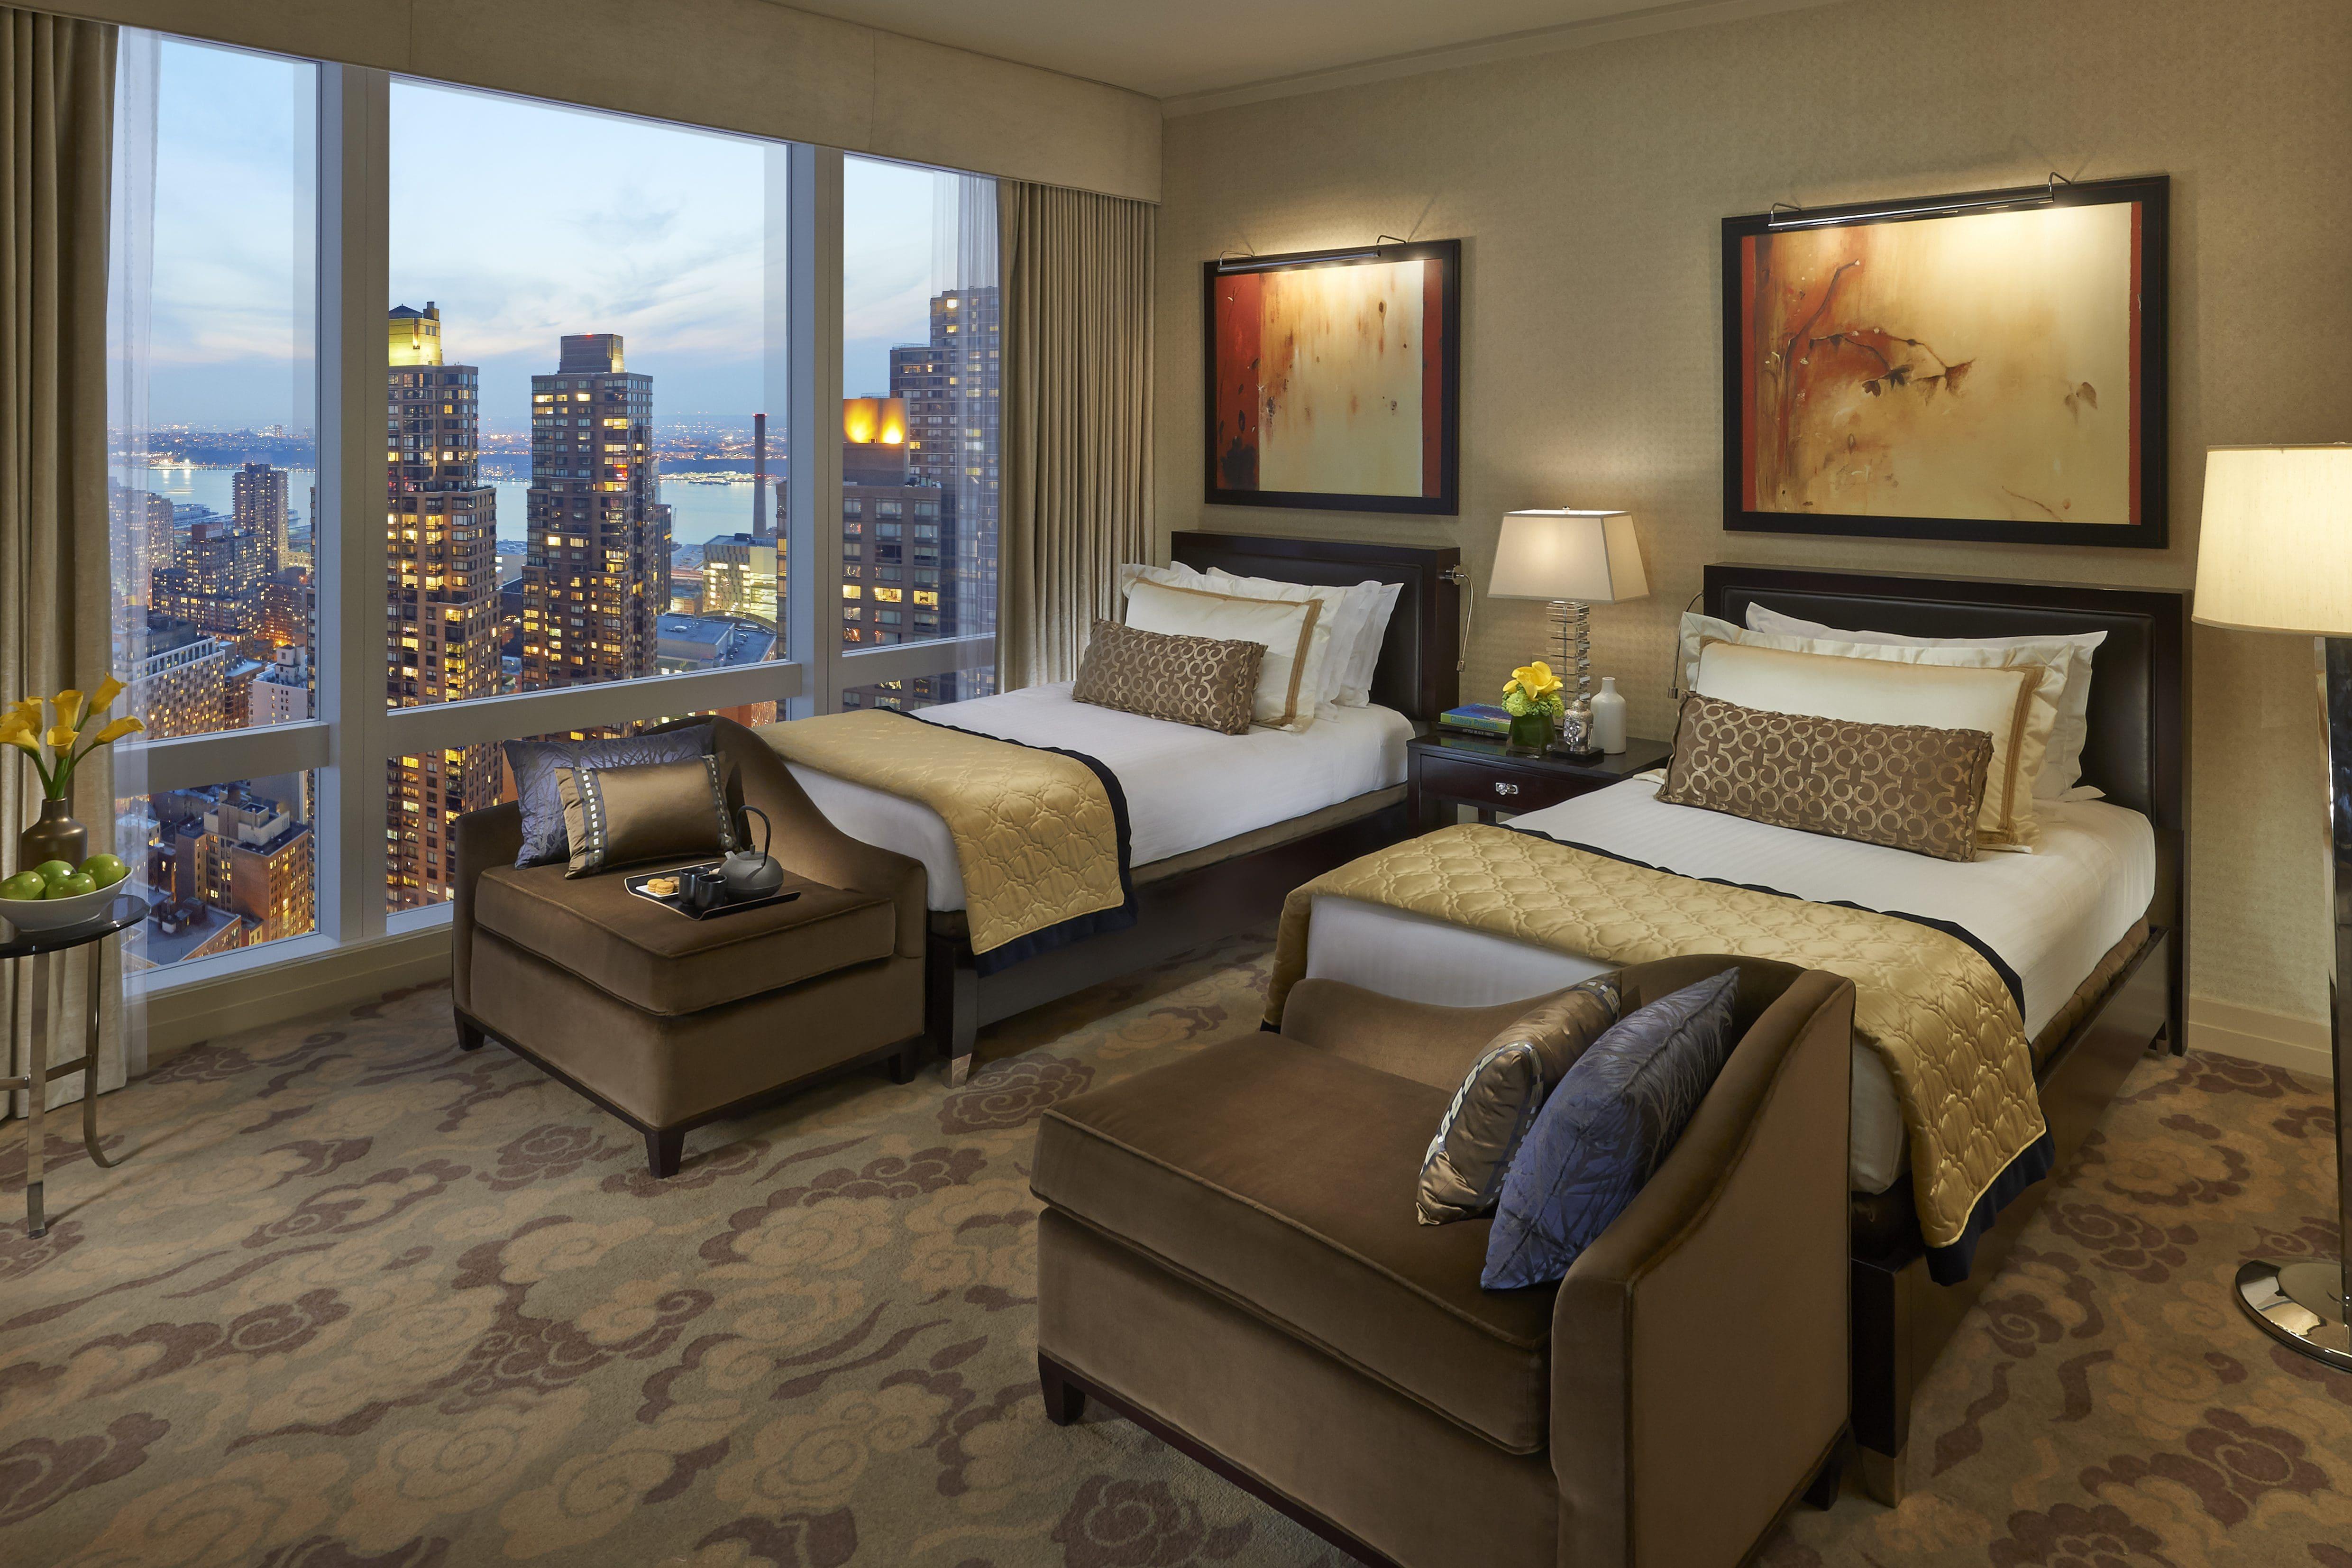 City View Room